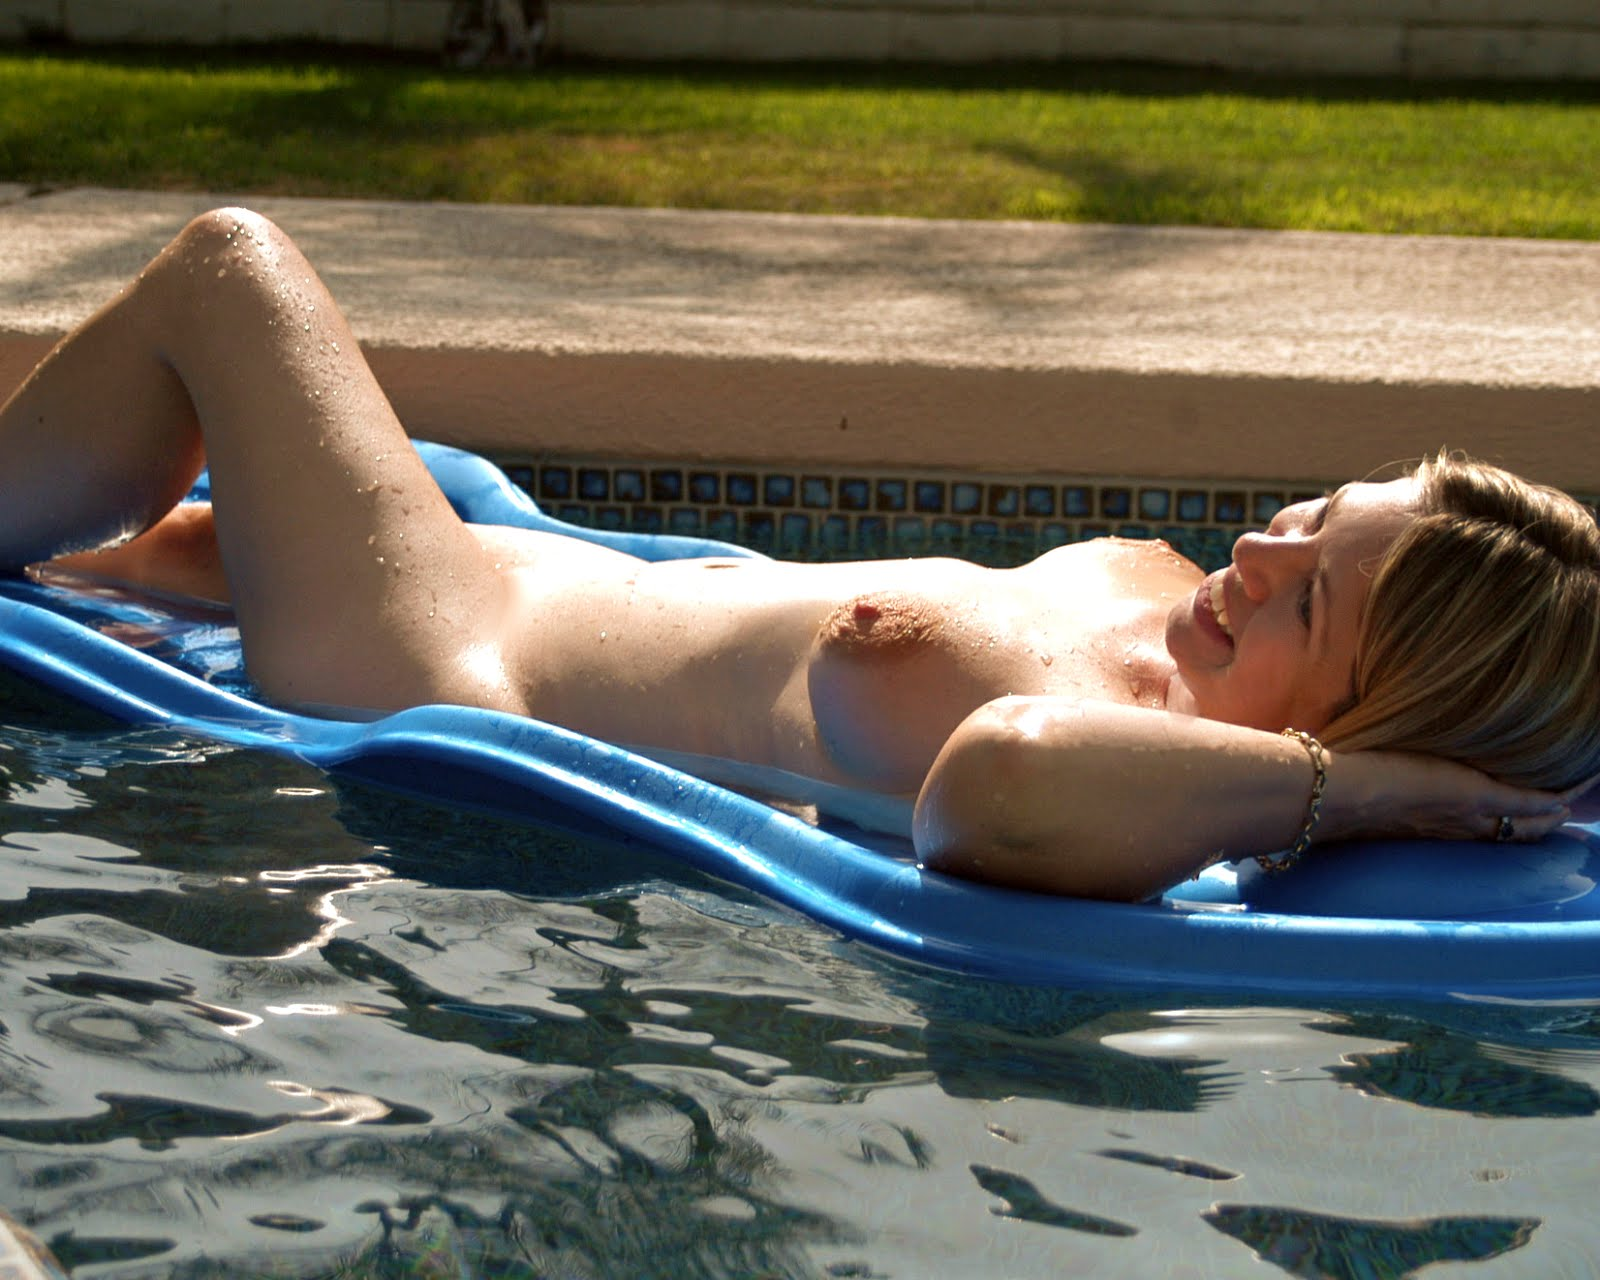 Terracotta Inn Nude Resort In Palm Springs